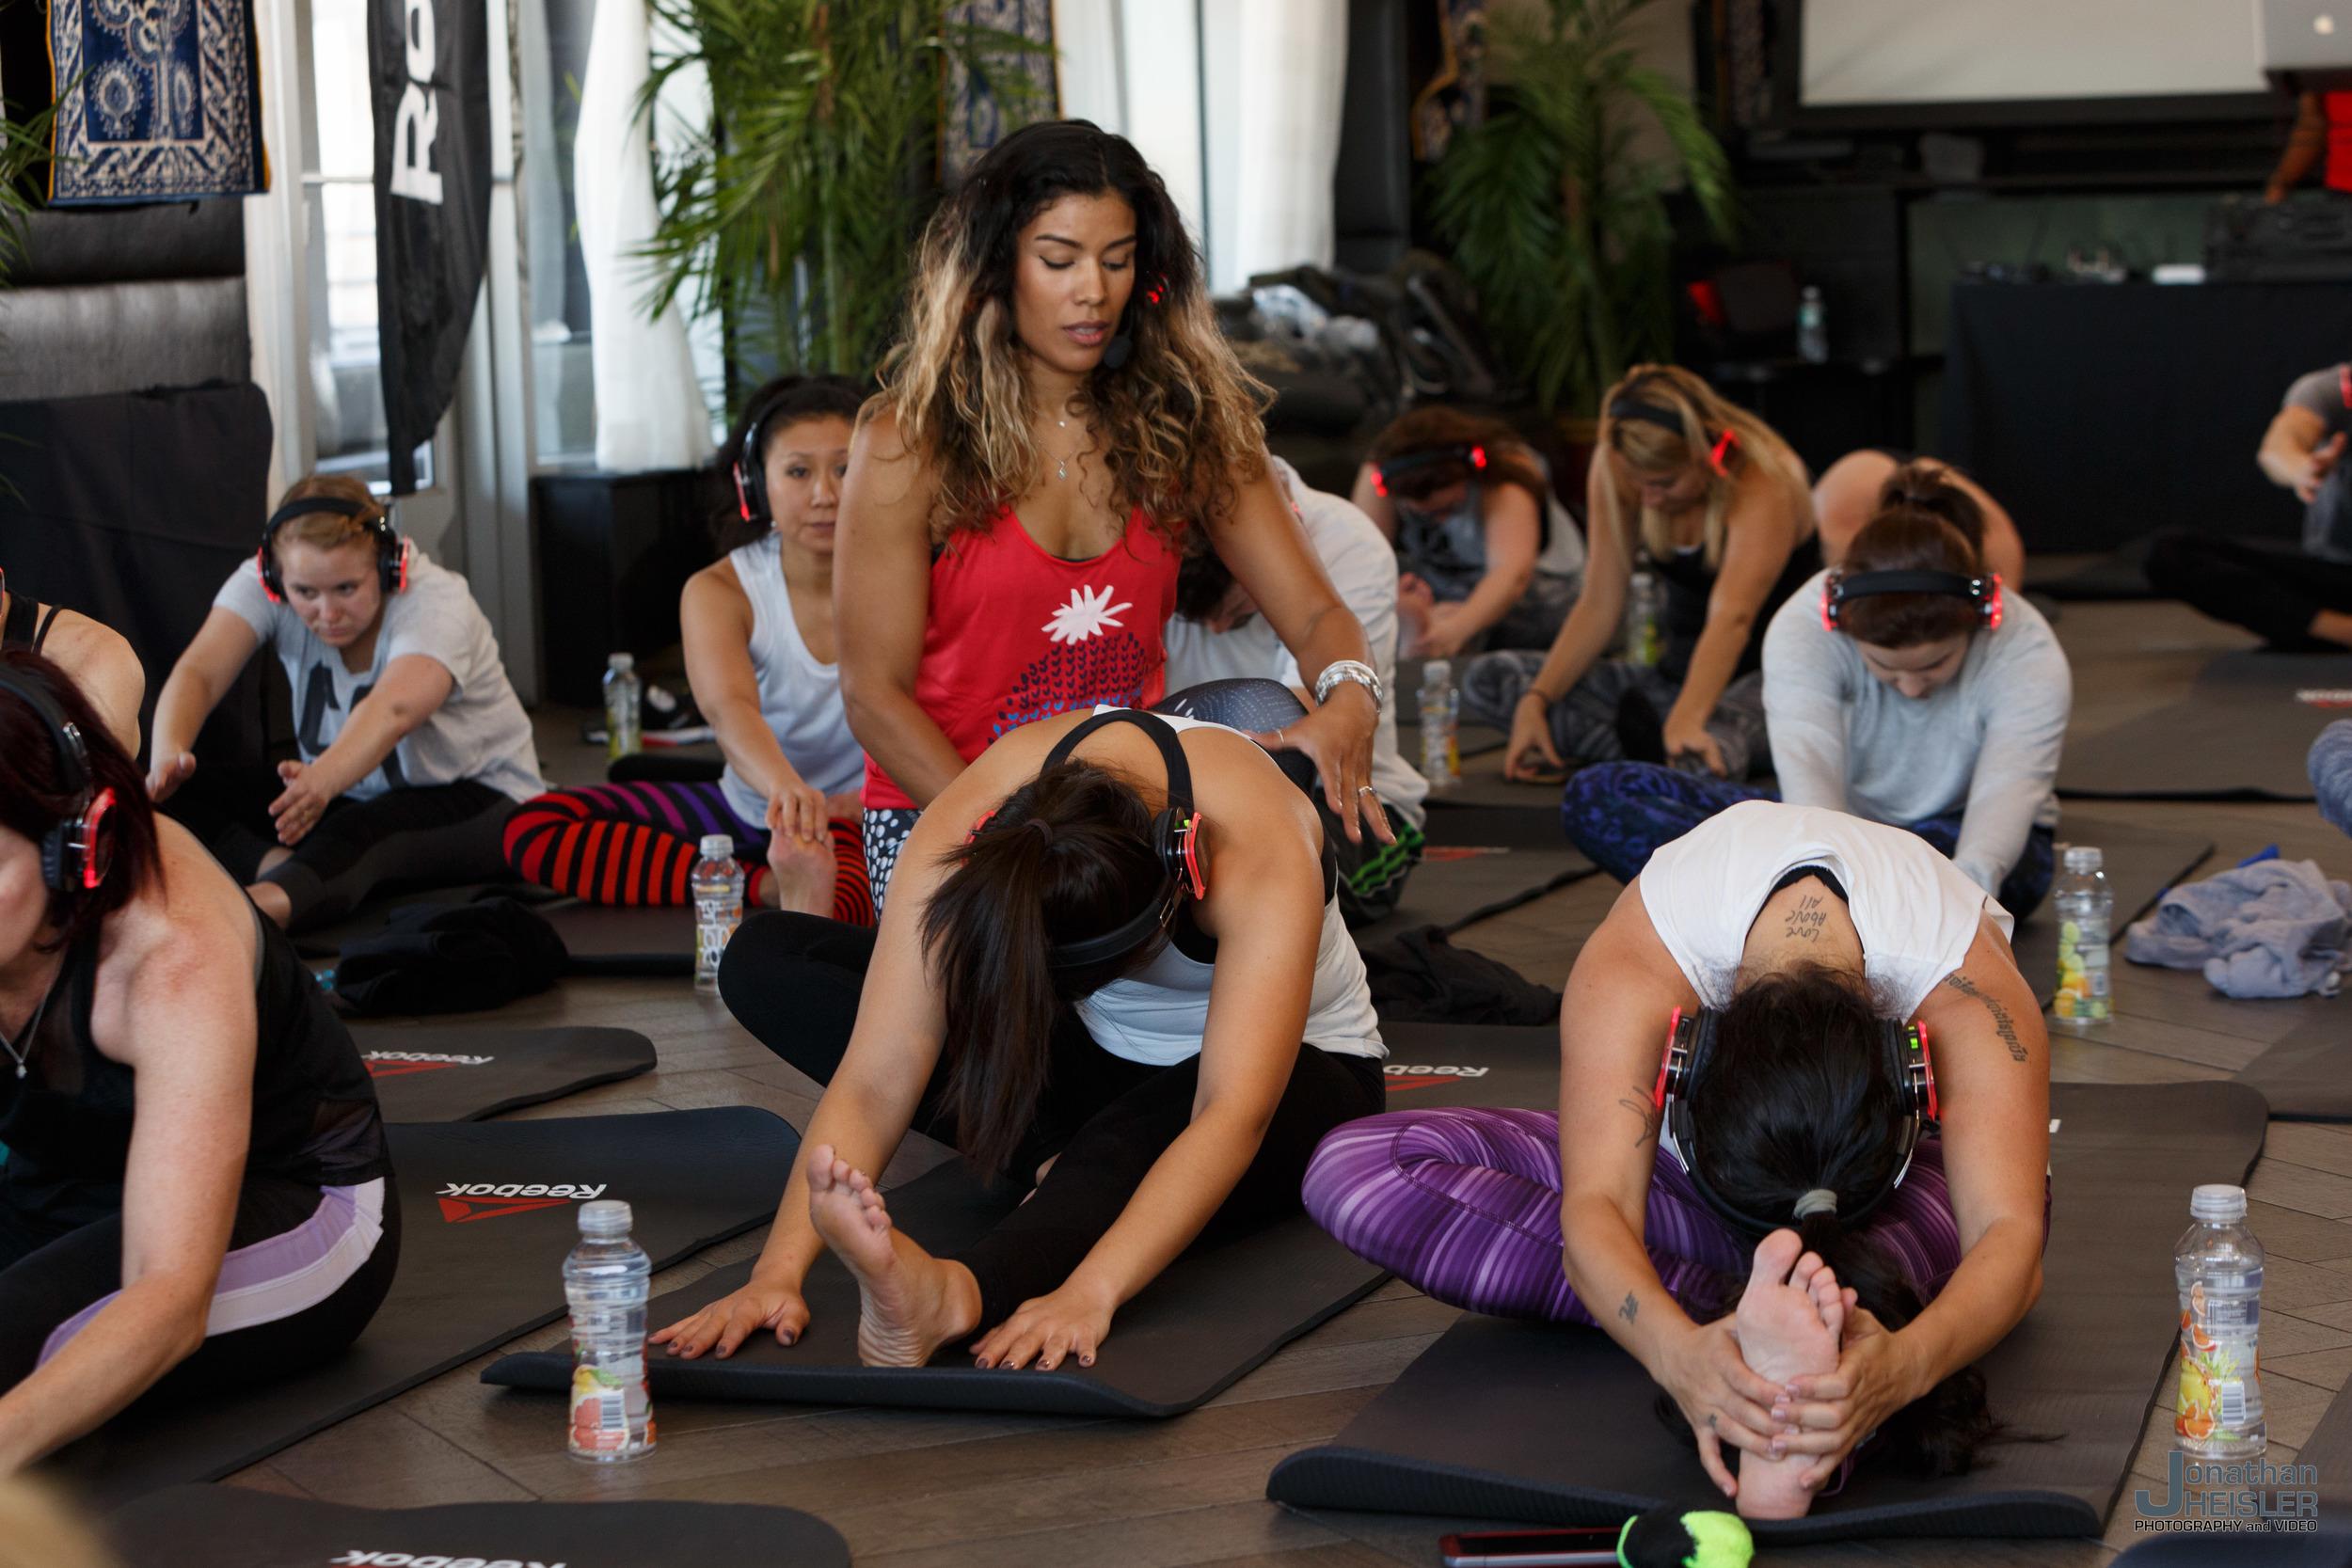 Reebok NYC Yoga_ Gansevoort Hotel NYC __  Jonathan Heisler _ 11.21.2015_017f_5.0.jpg